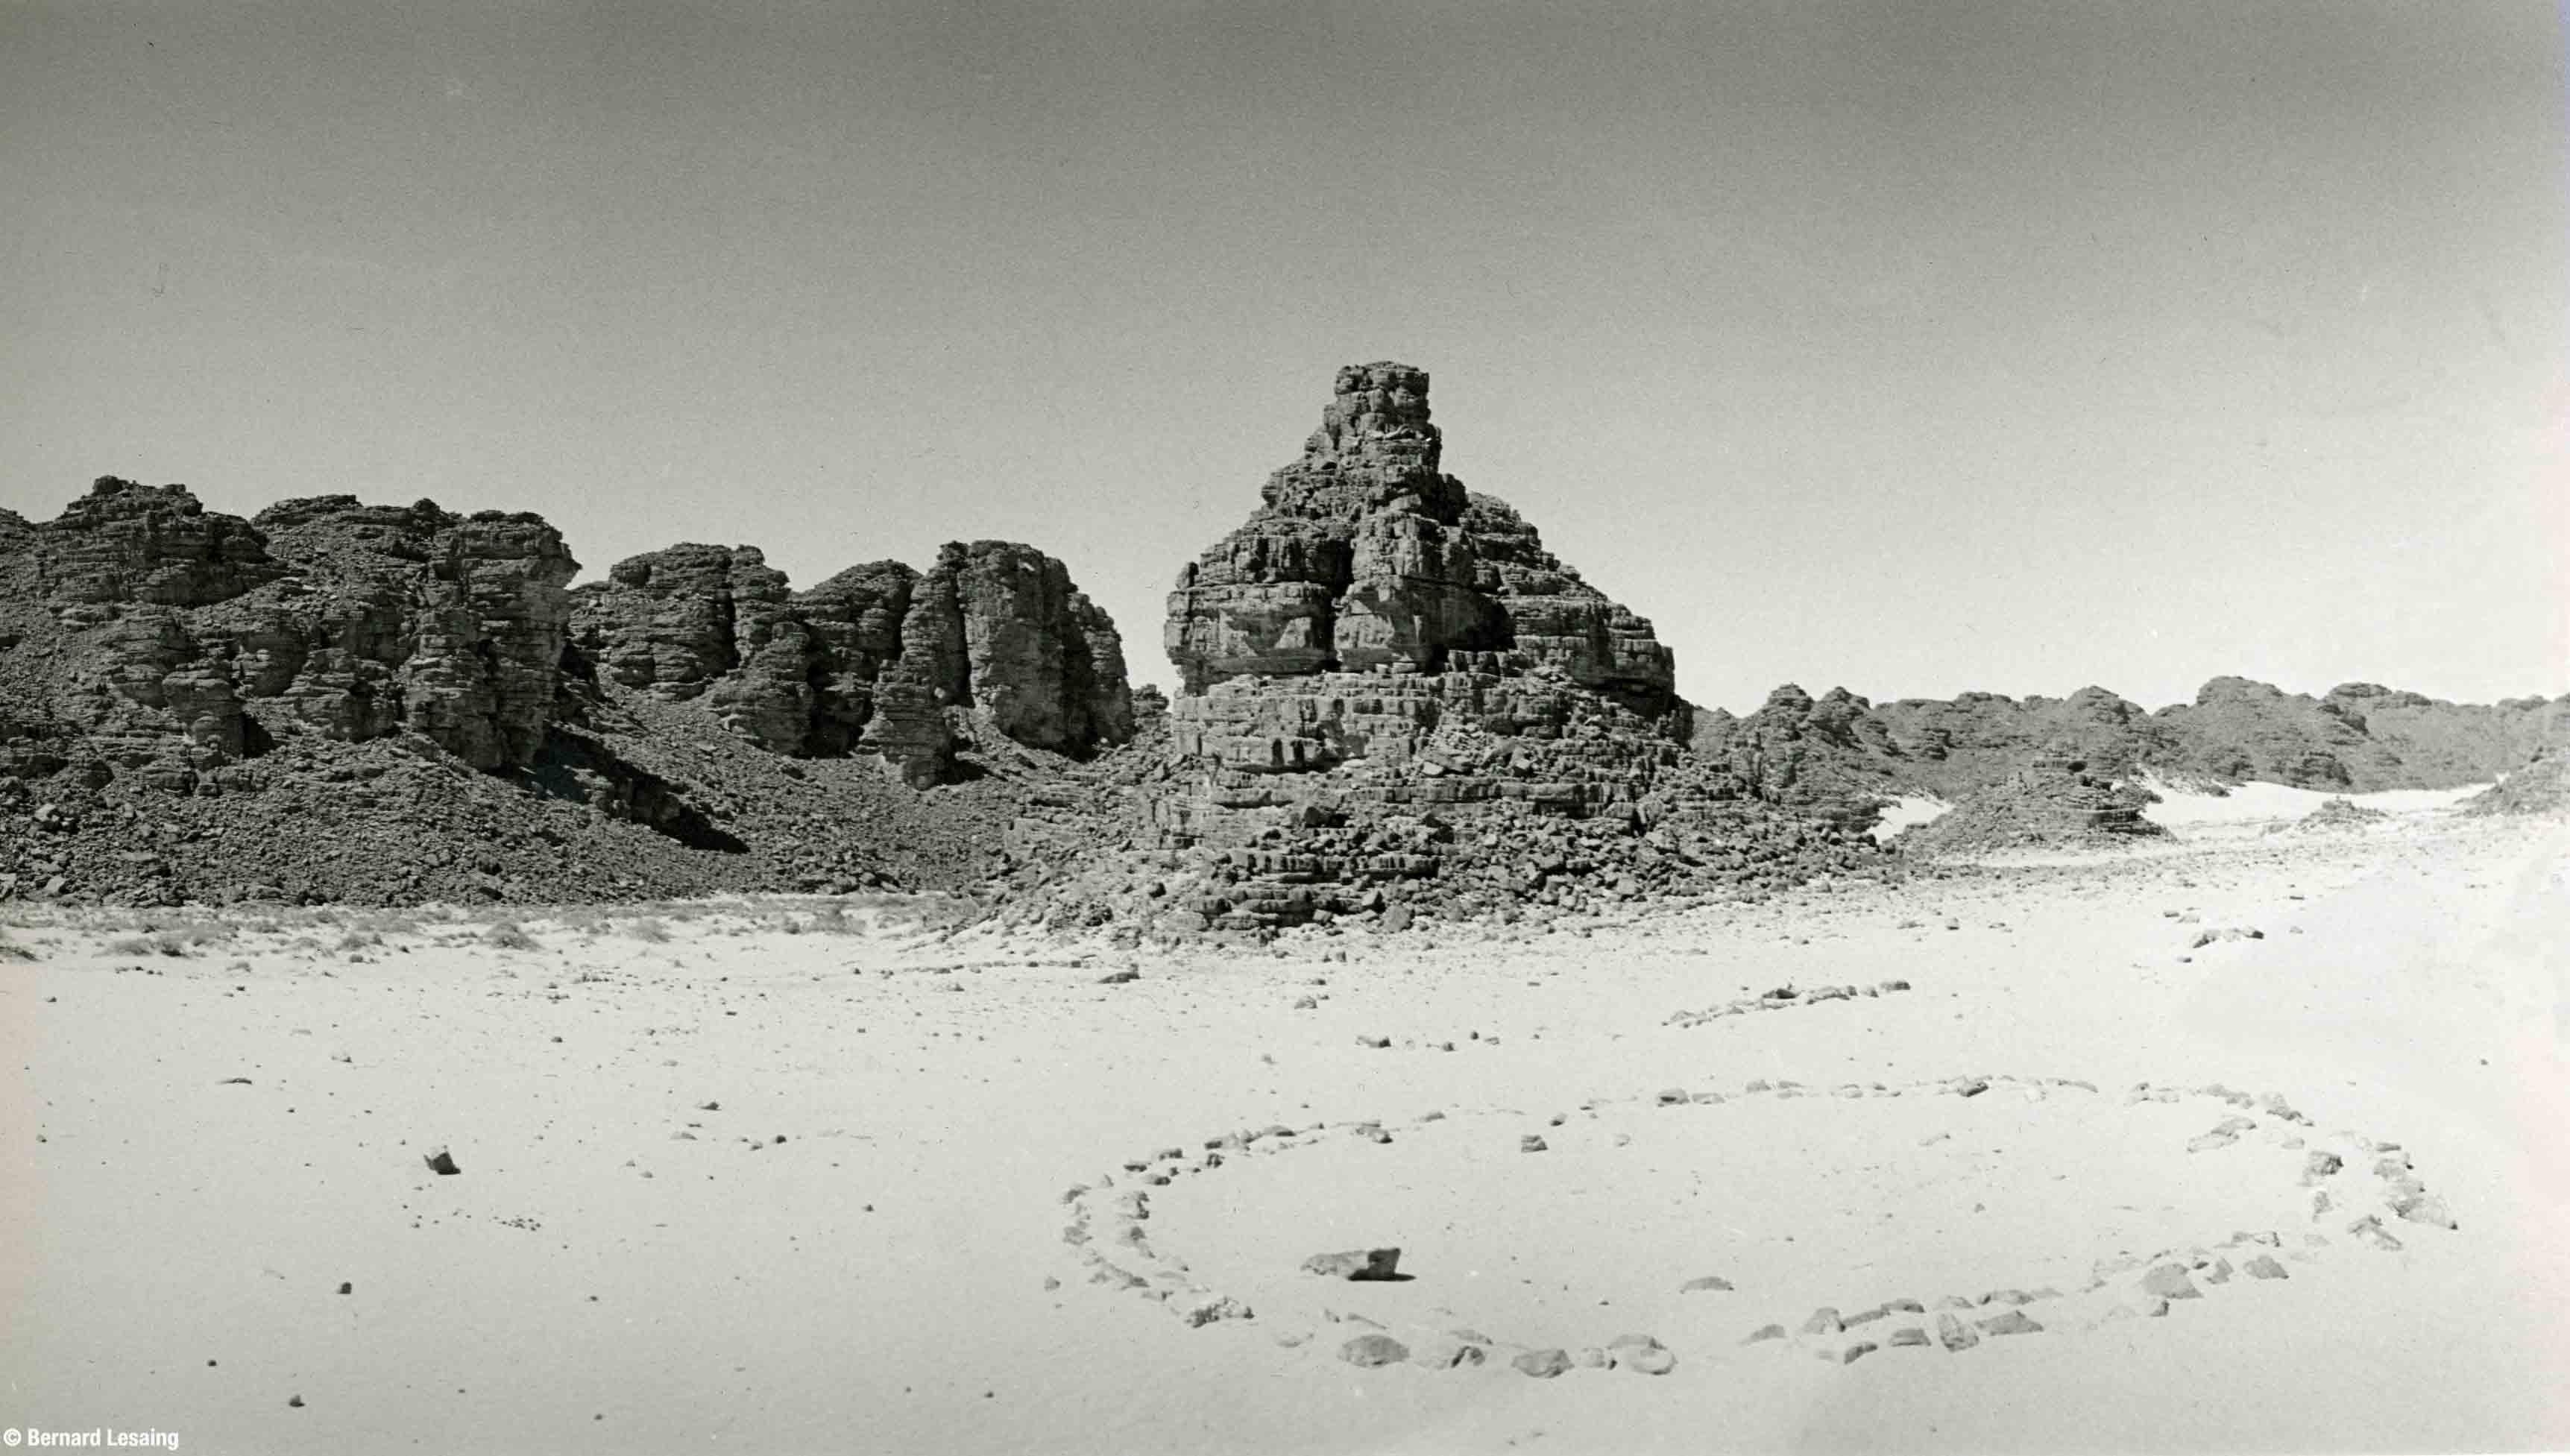 Oasis de Djanet, Algérie, 2004 © Bernard Lesaing